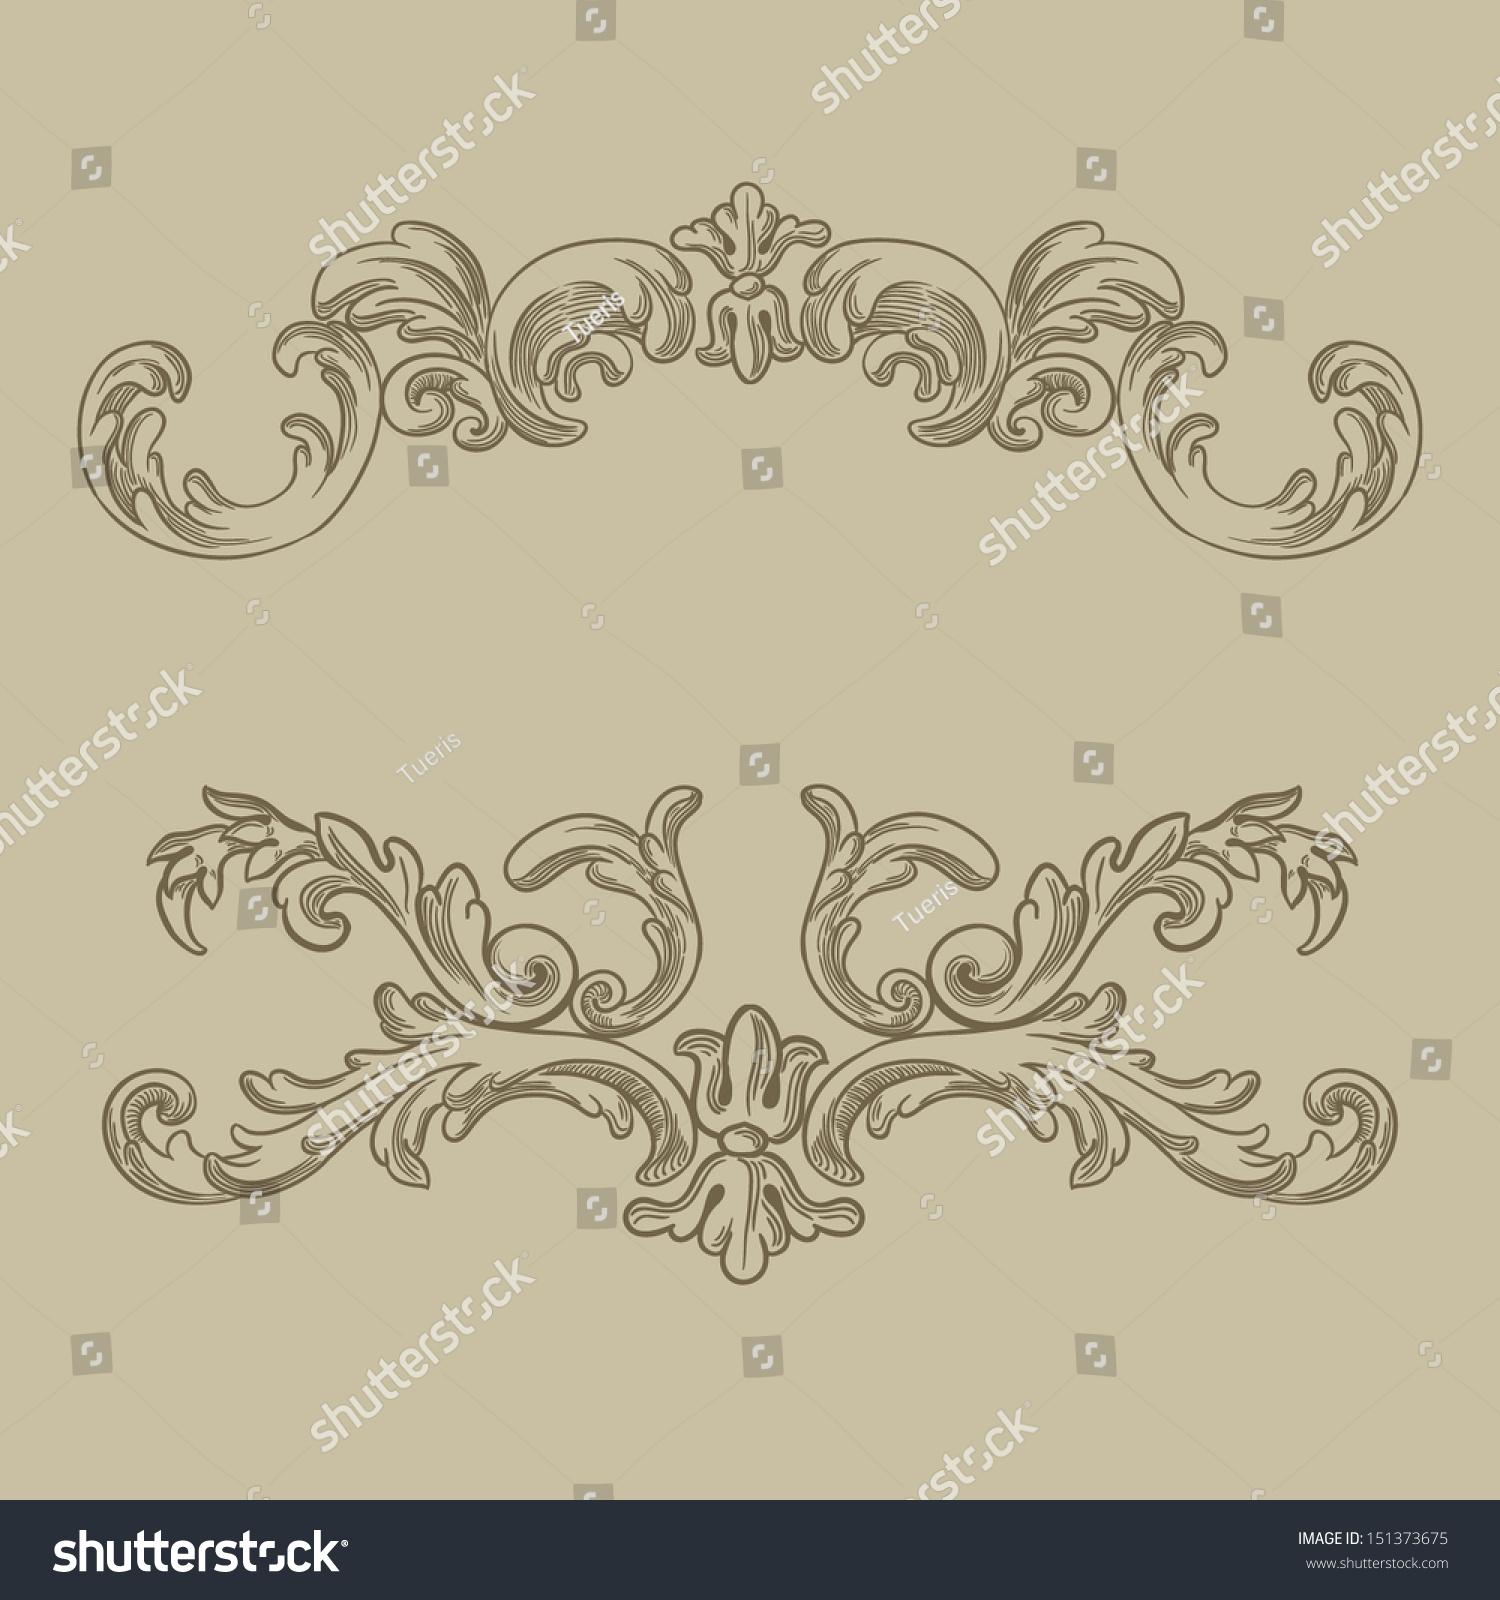 Antique Scroll Vector: Vector Vintage Baroque Engraving Floral Scroll Stock